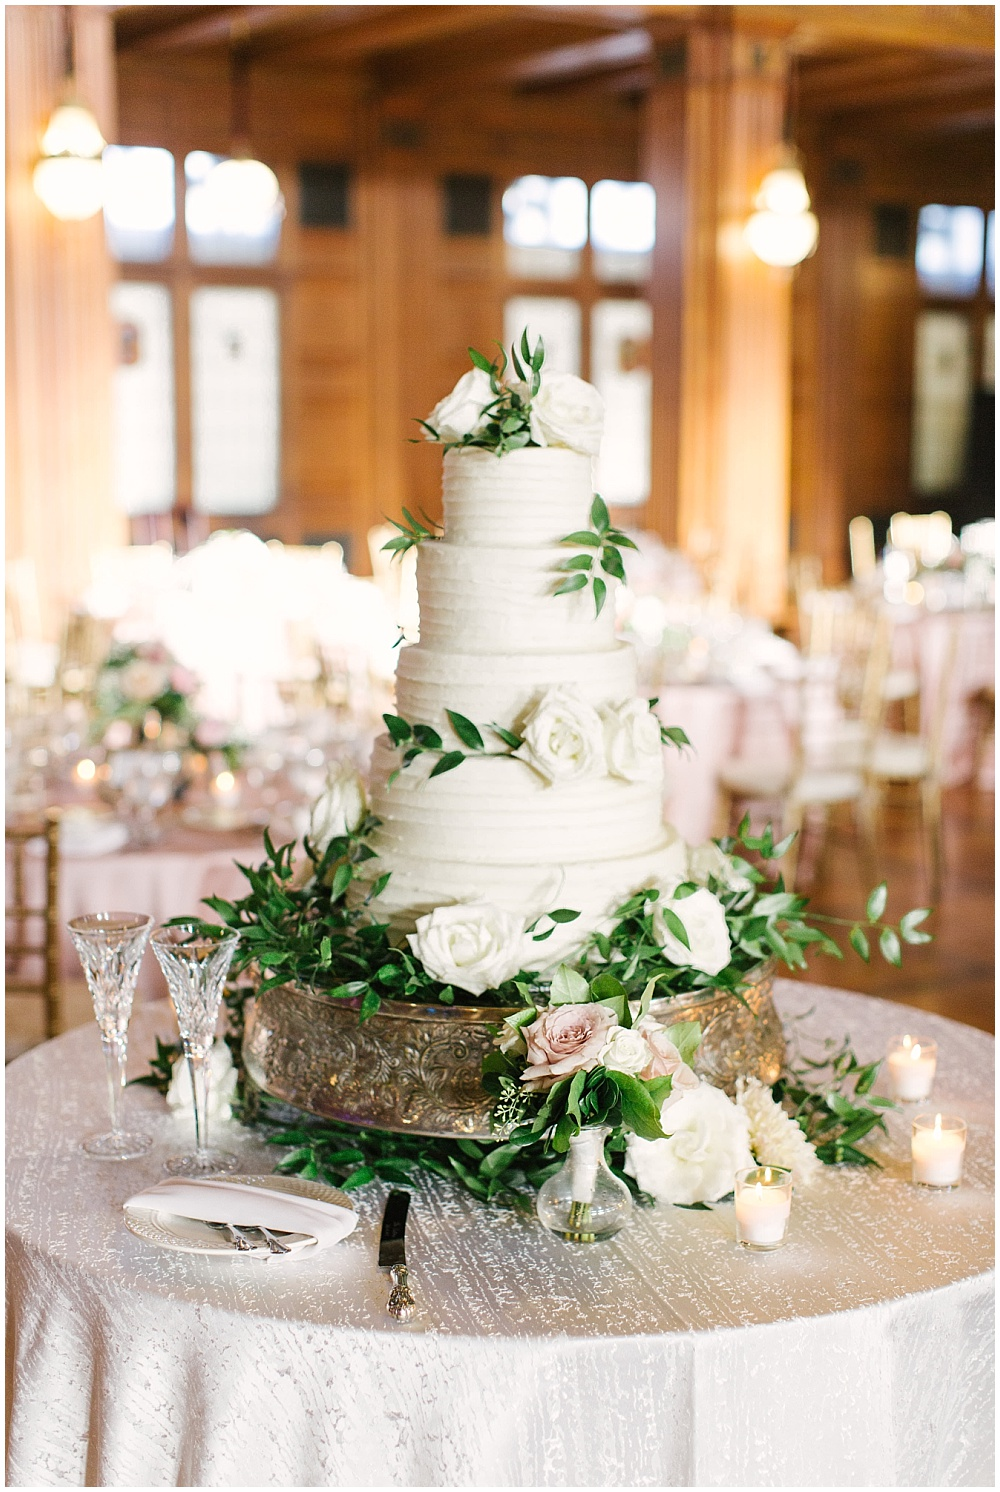 white wedding cake with greenery; Navy + blush wedding; Scottish Rite Cathedral Indianapolis | Traci & Troy Photography and Jessica Dum Wedding Coordination